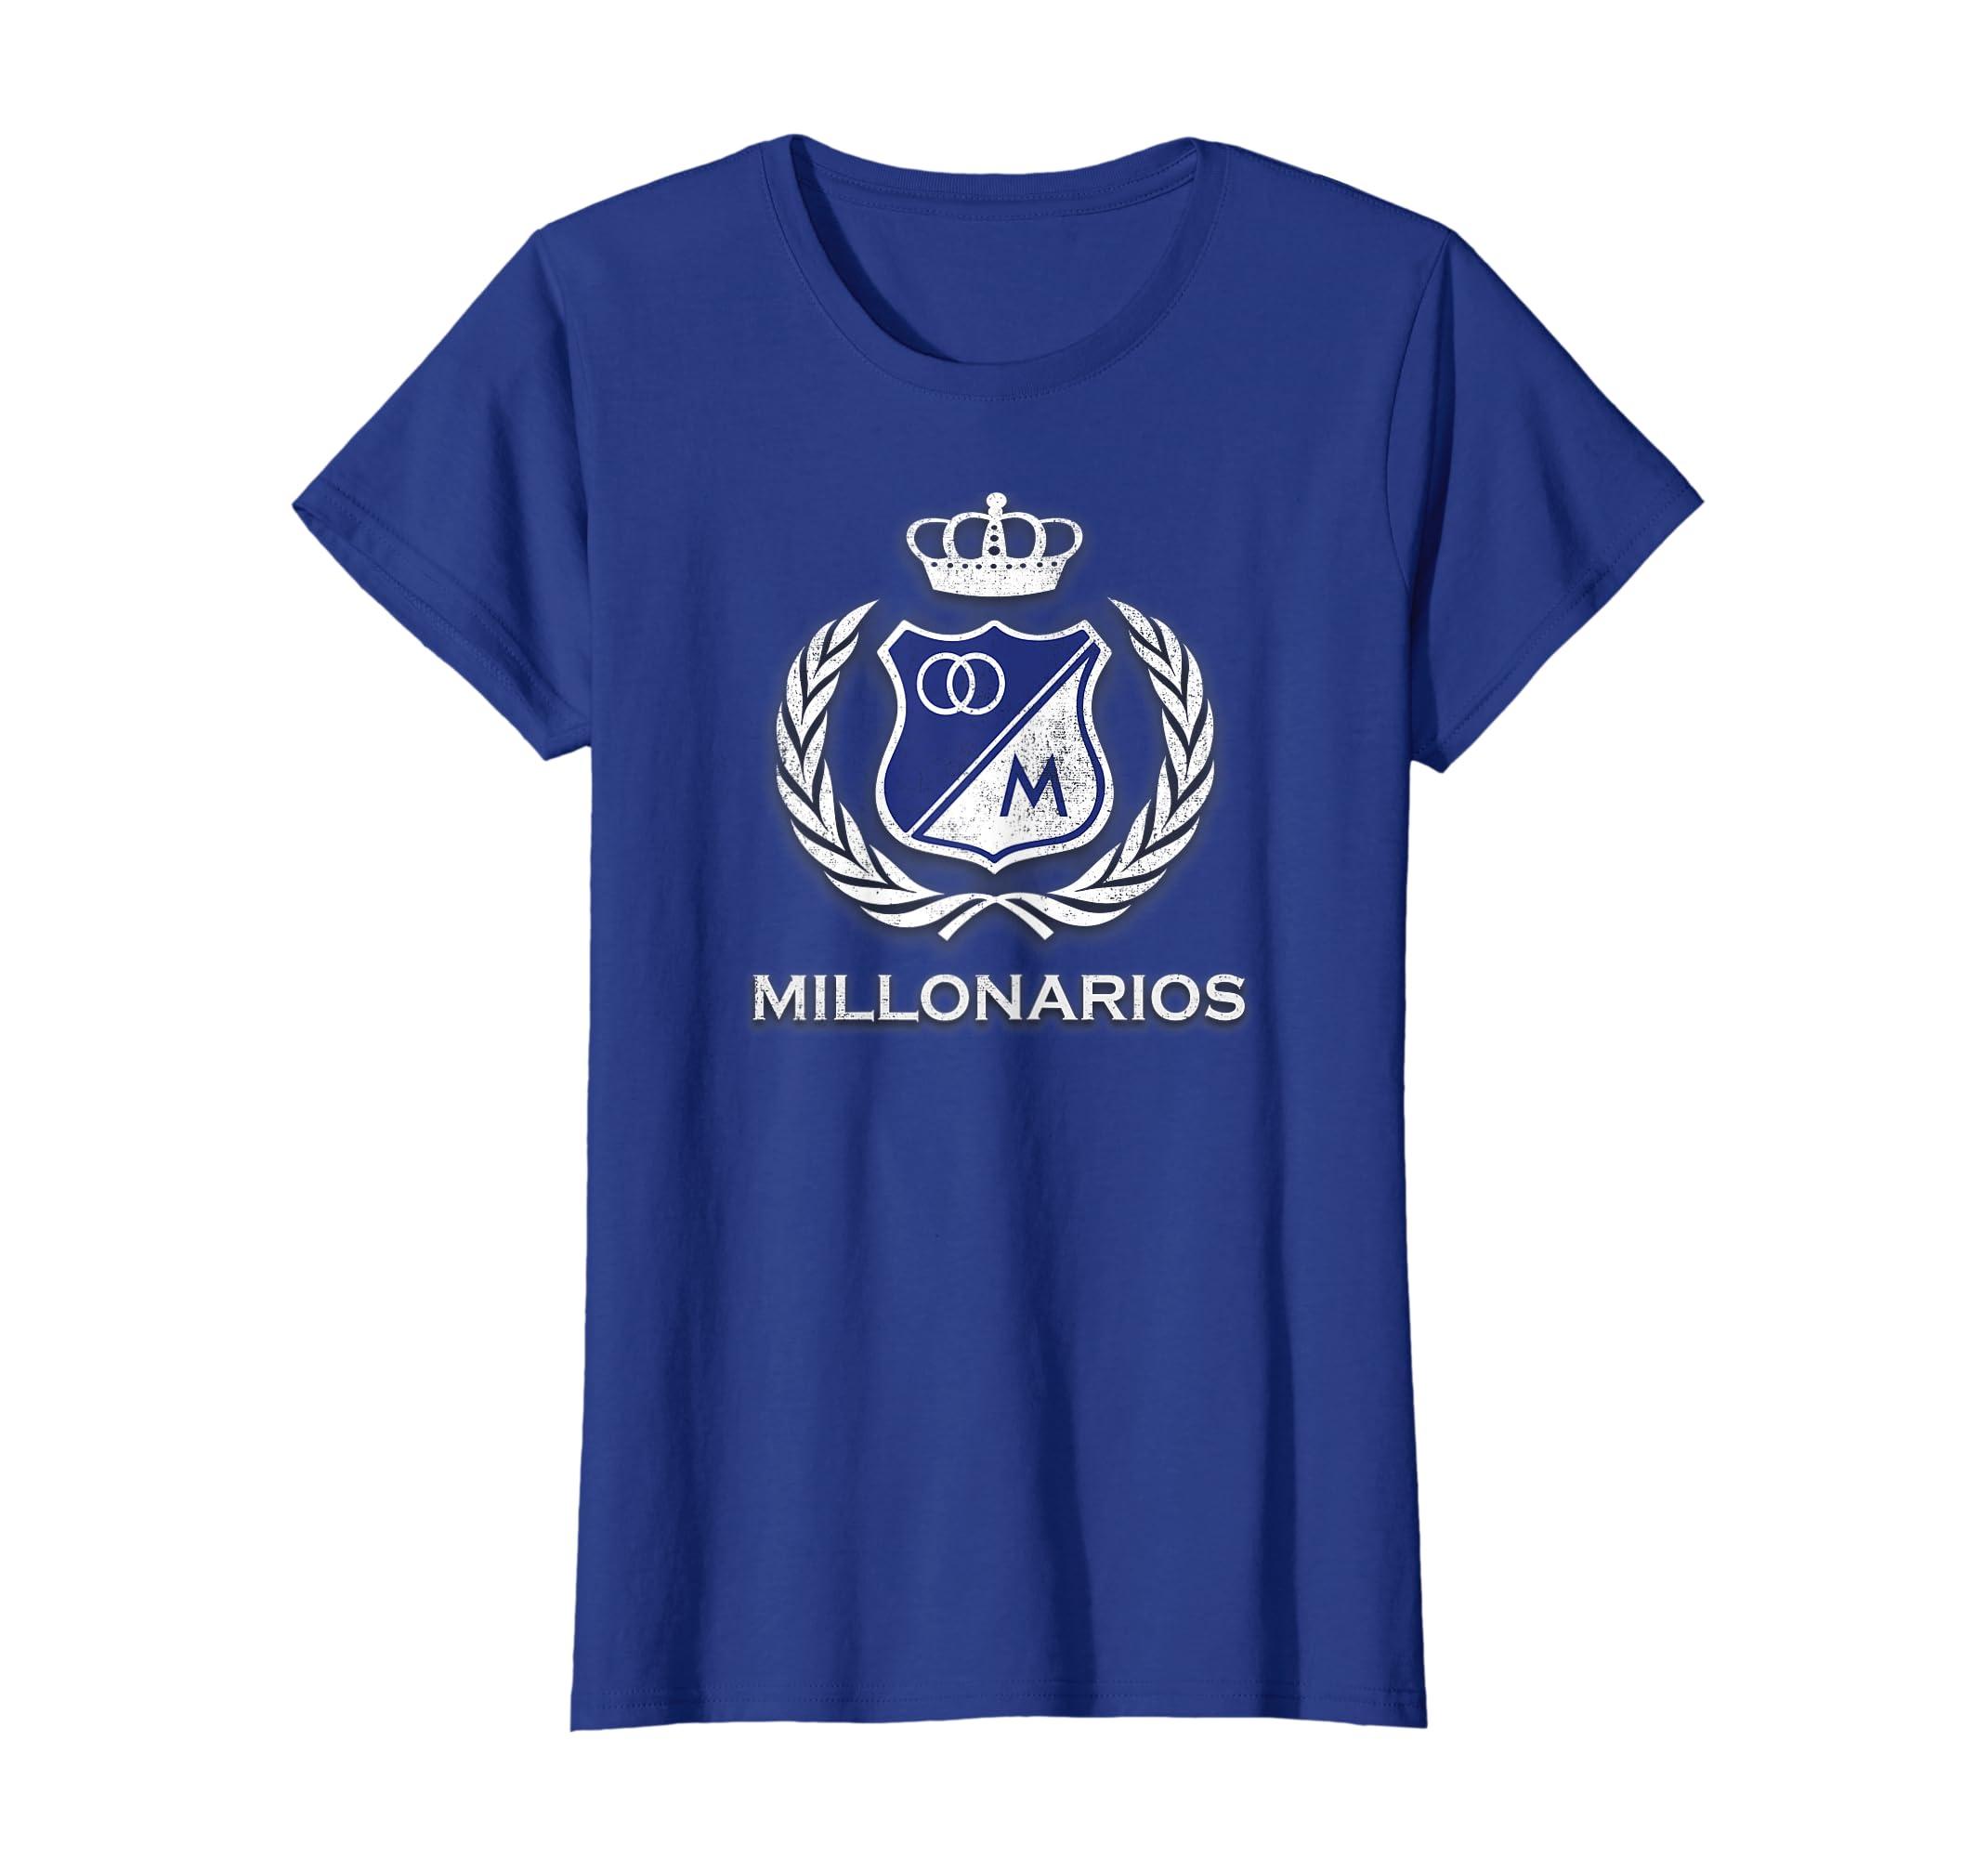 Amazon.com: Bogota T Shirt - Millonarios Futbol Club Camiseta Camisa Tee: Clothing